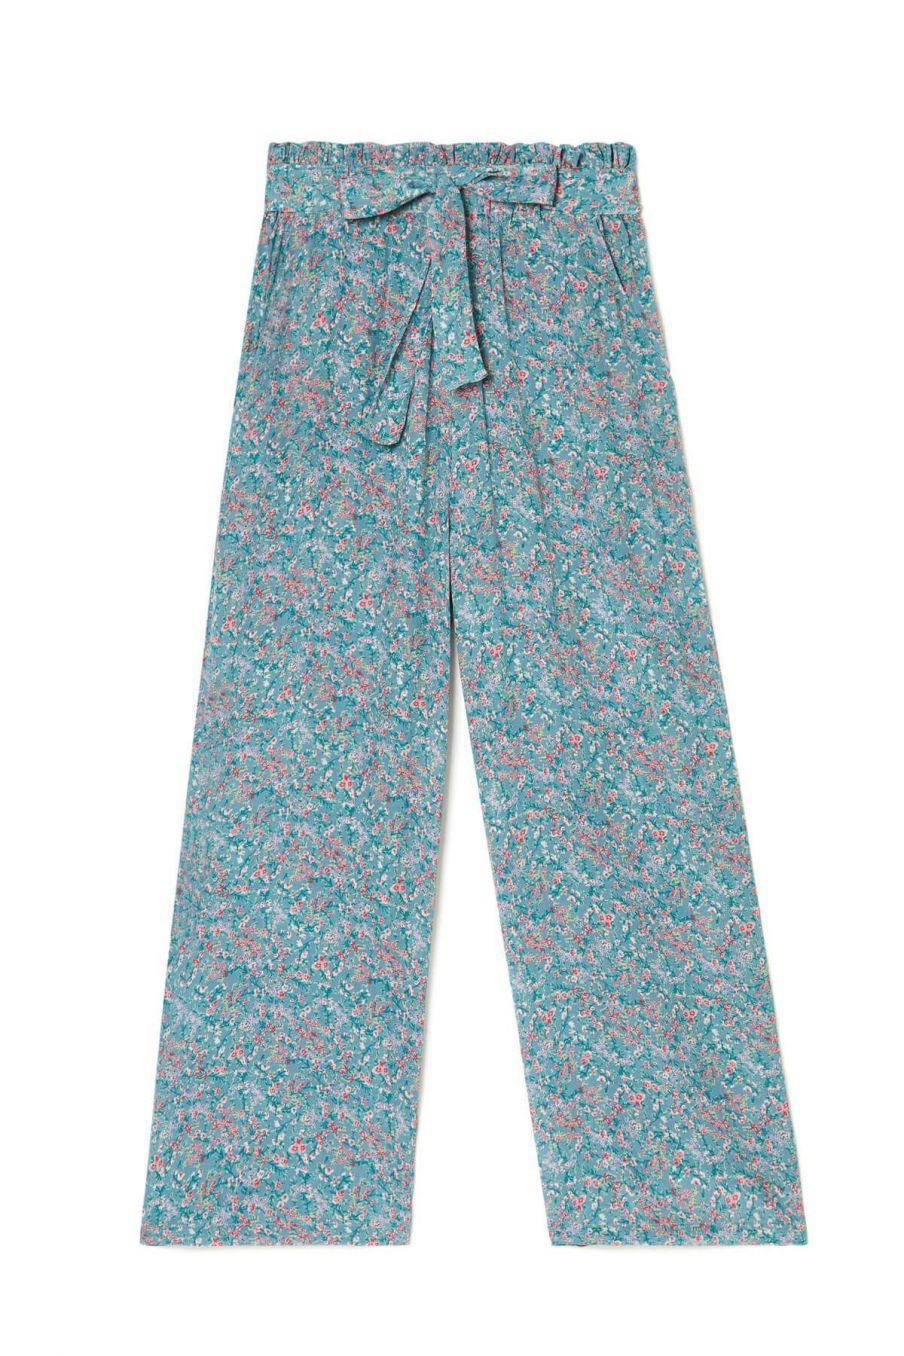 boheme chic vintage pantalon femme lenita storm spring flowers